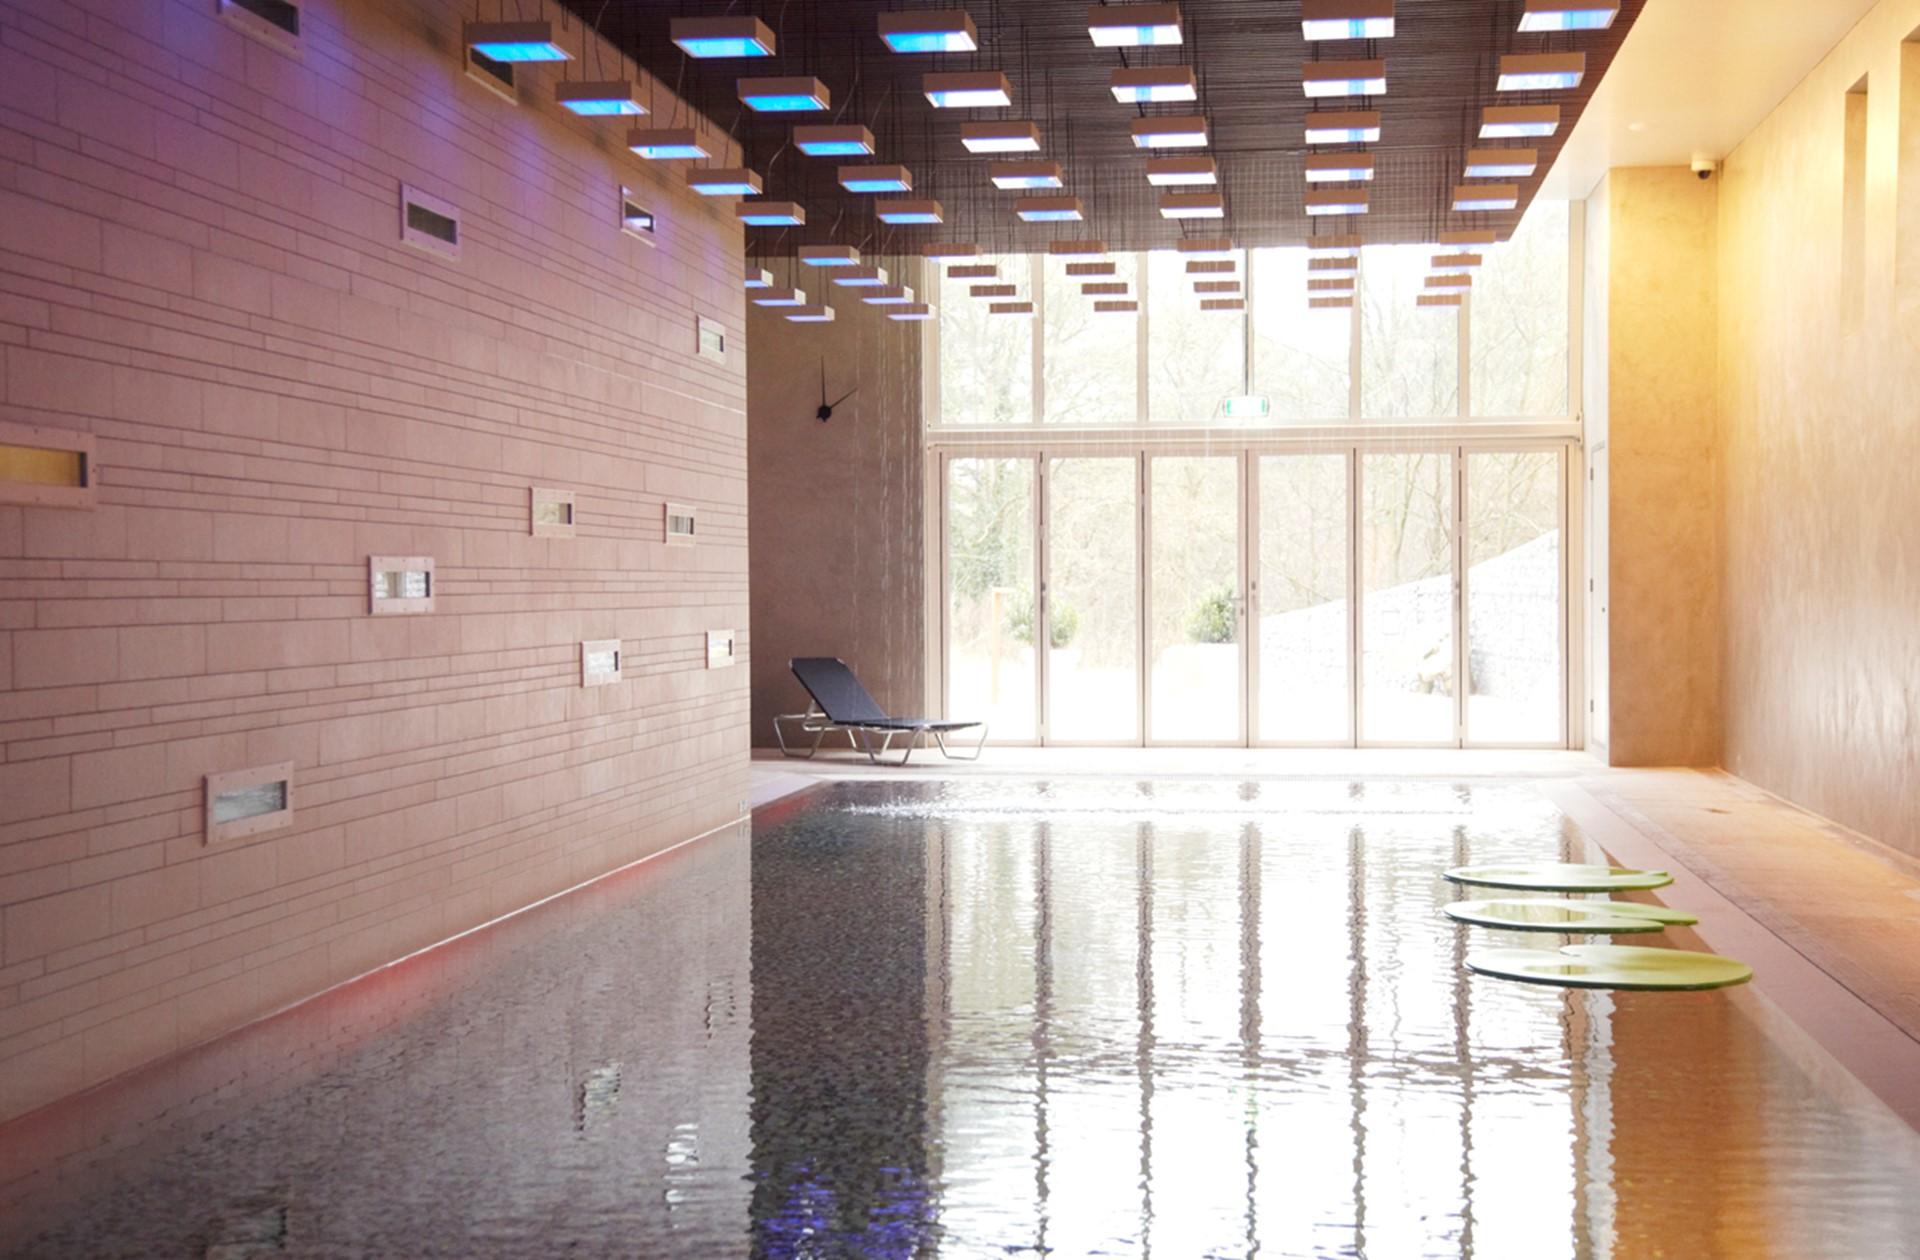 LR overzicht zwembad blooming hotel.jpg